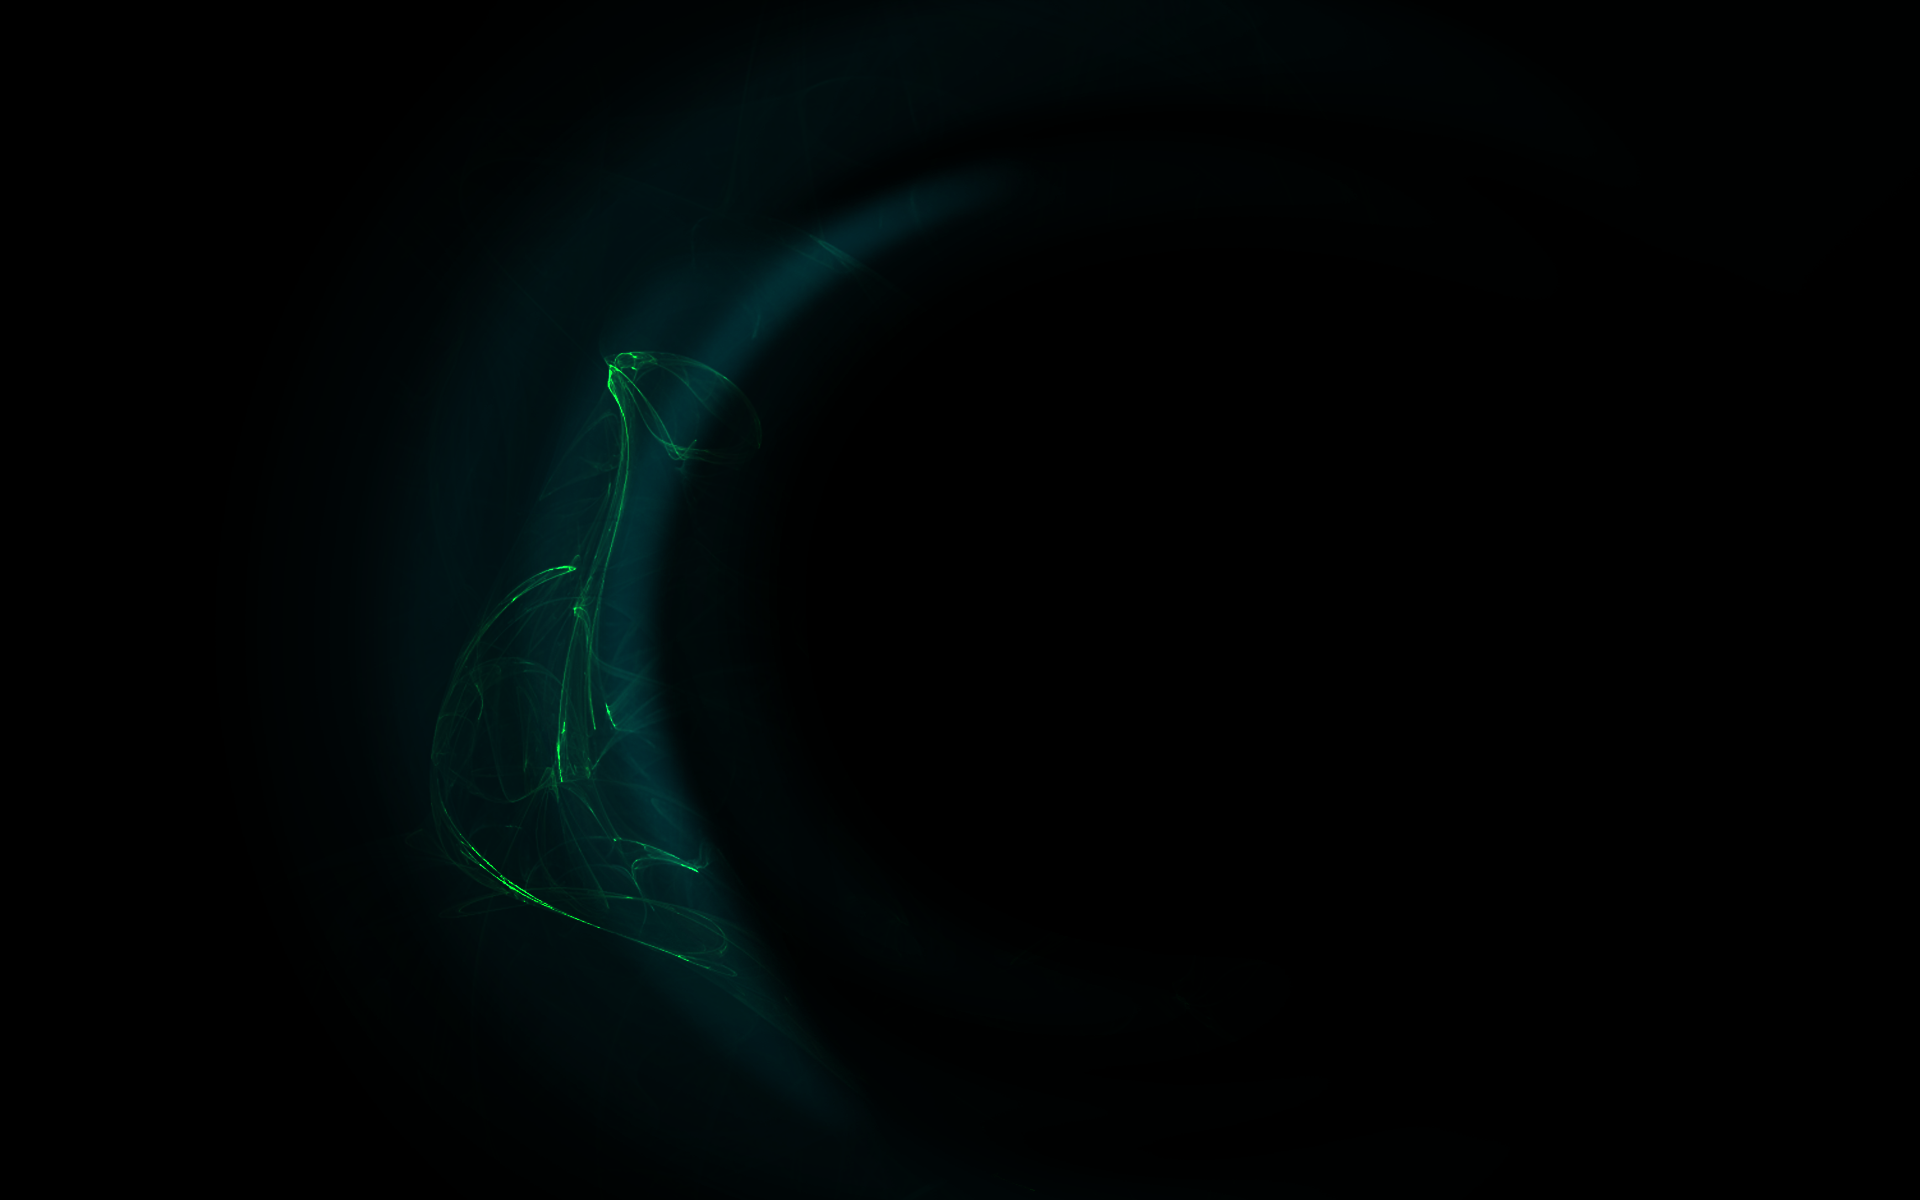 Sphere by Diggdydog